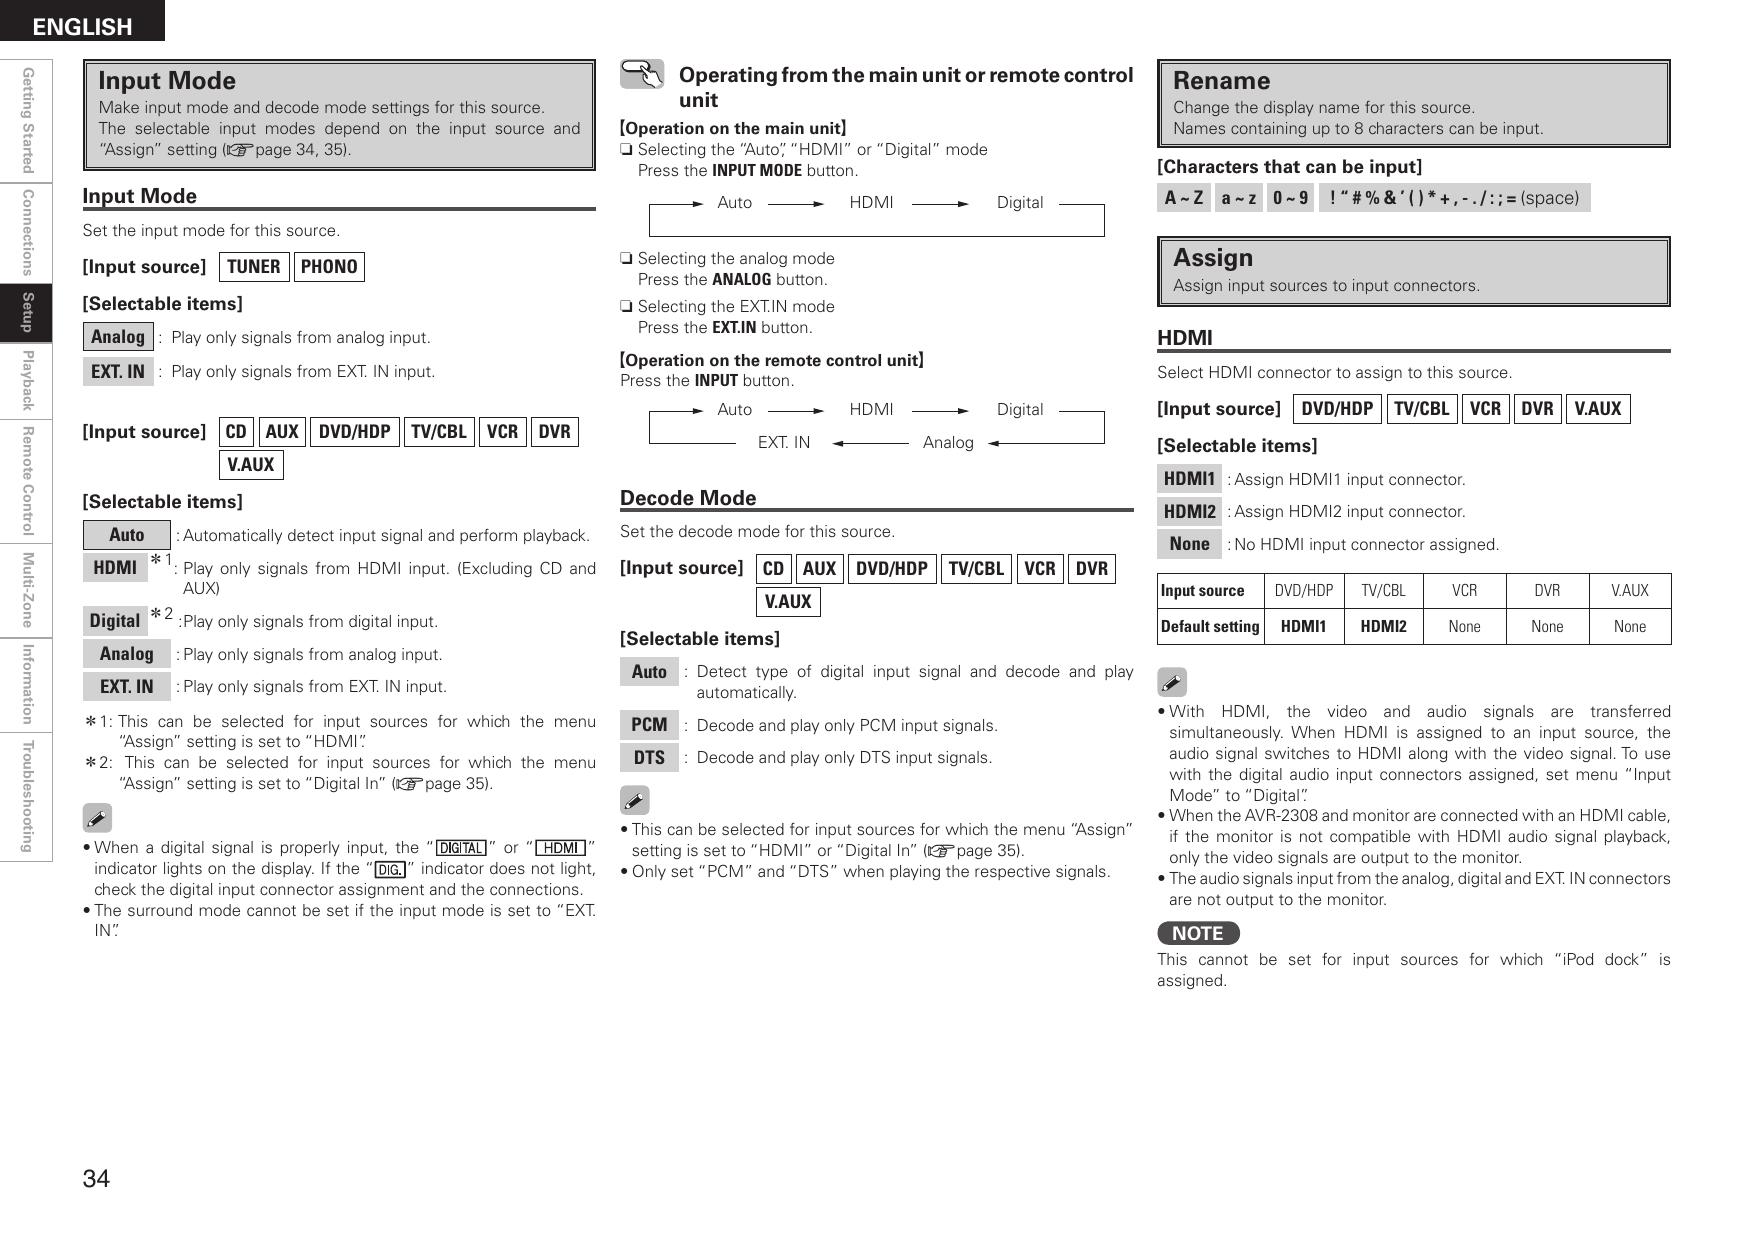 Denon Avr 2308 Users Manual 1 AVR2308E2_ENG